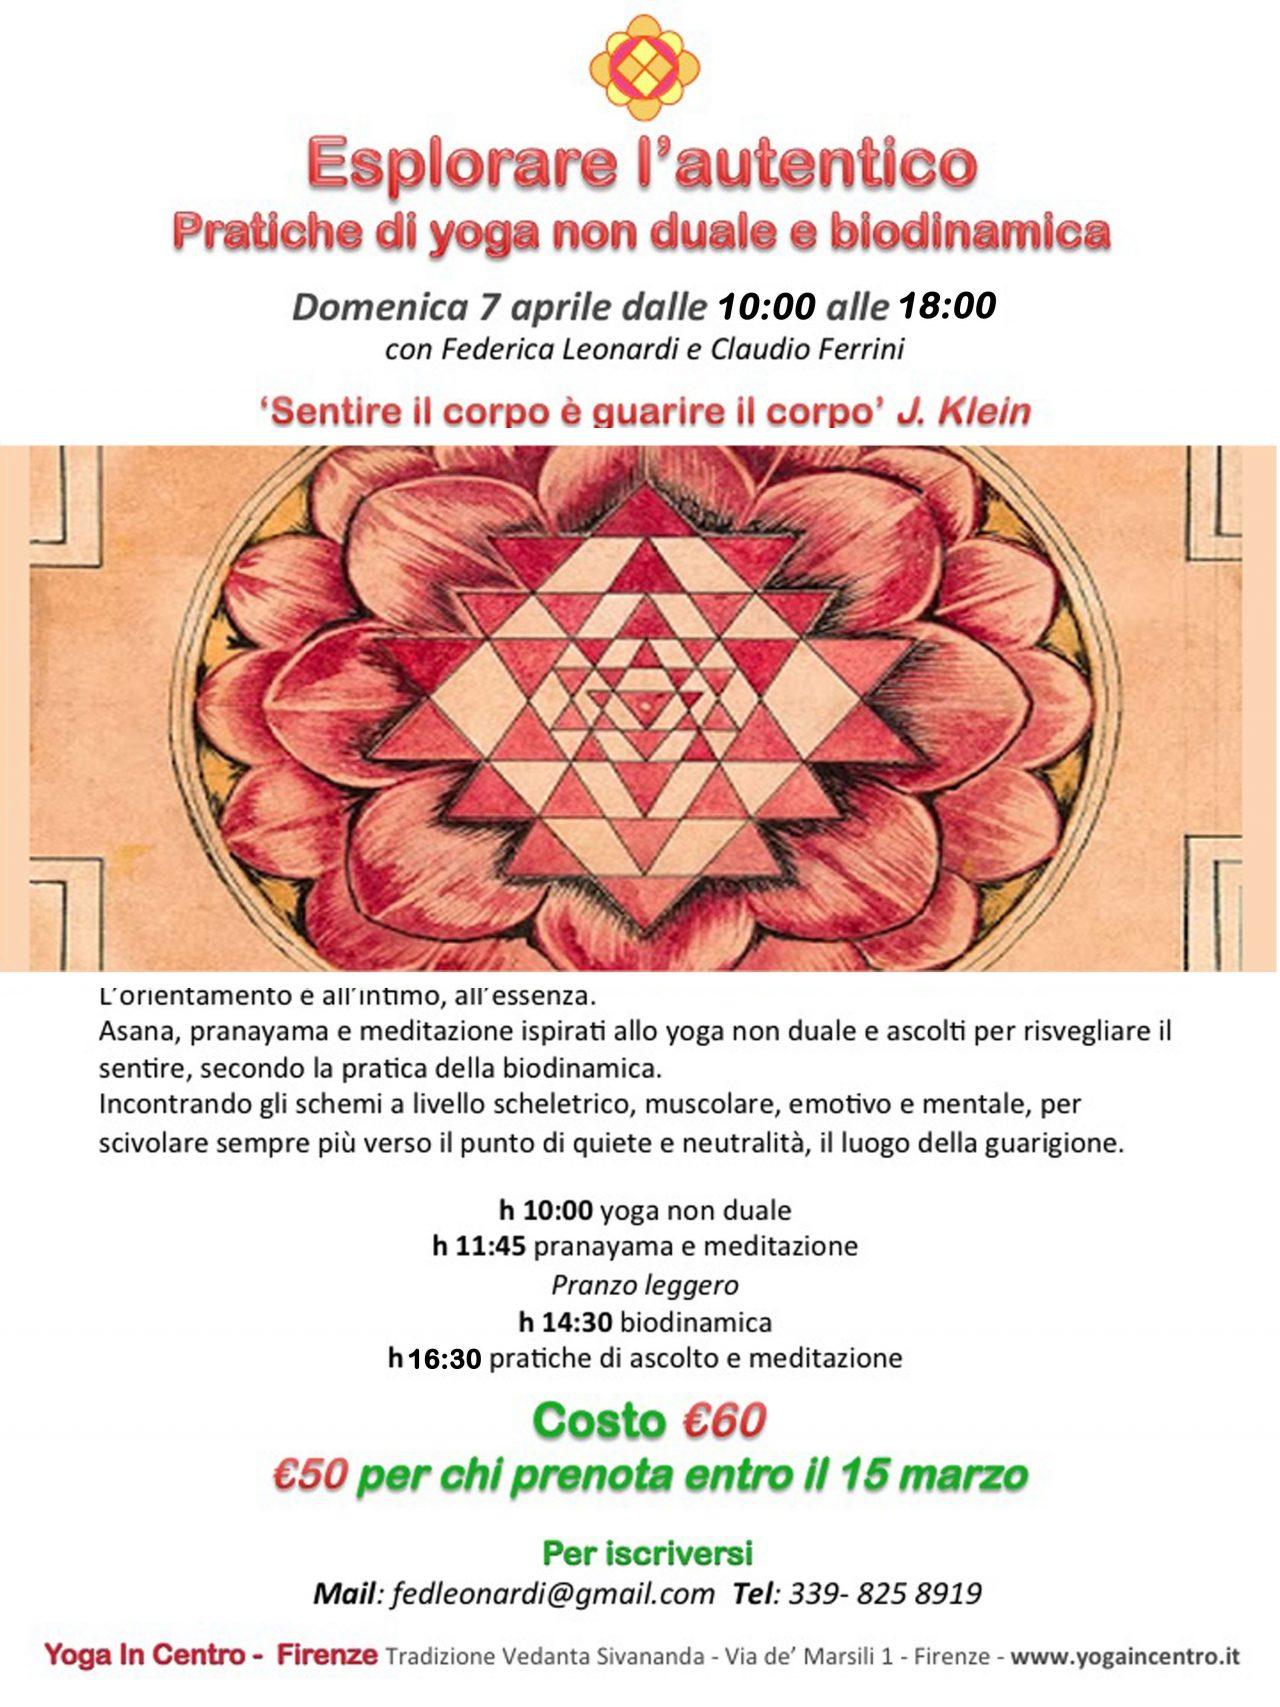 SeminarioYogaNonDuale7Aprile2019-1-1-1280x1707.jpg